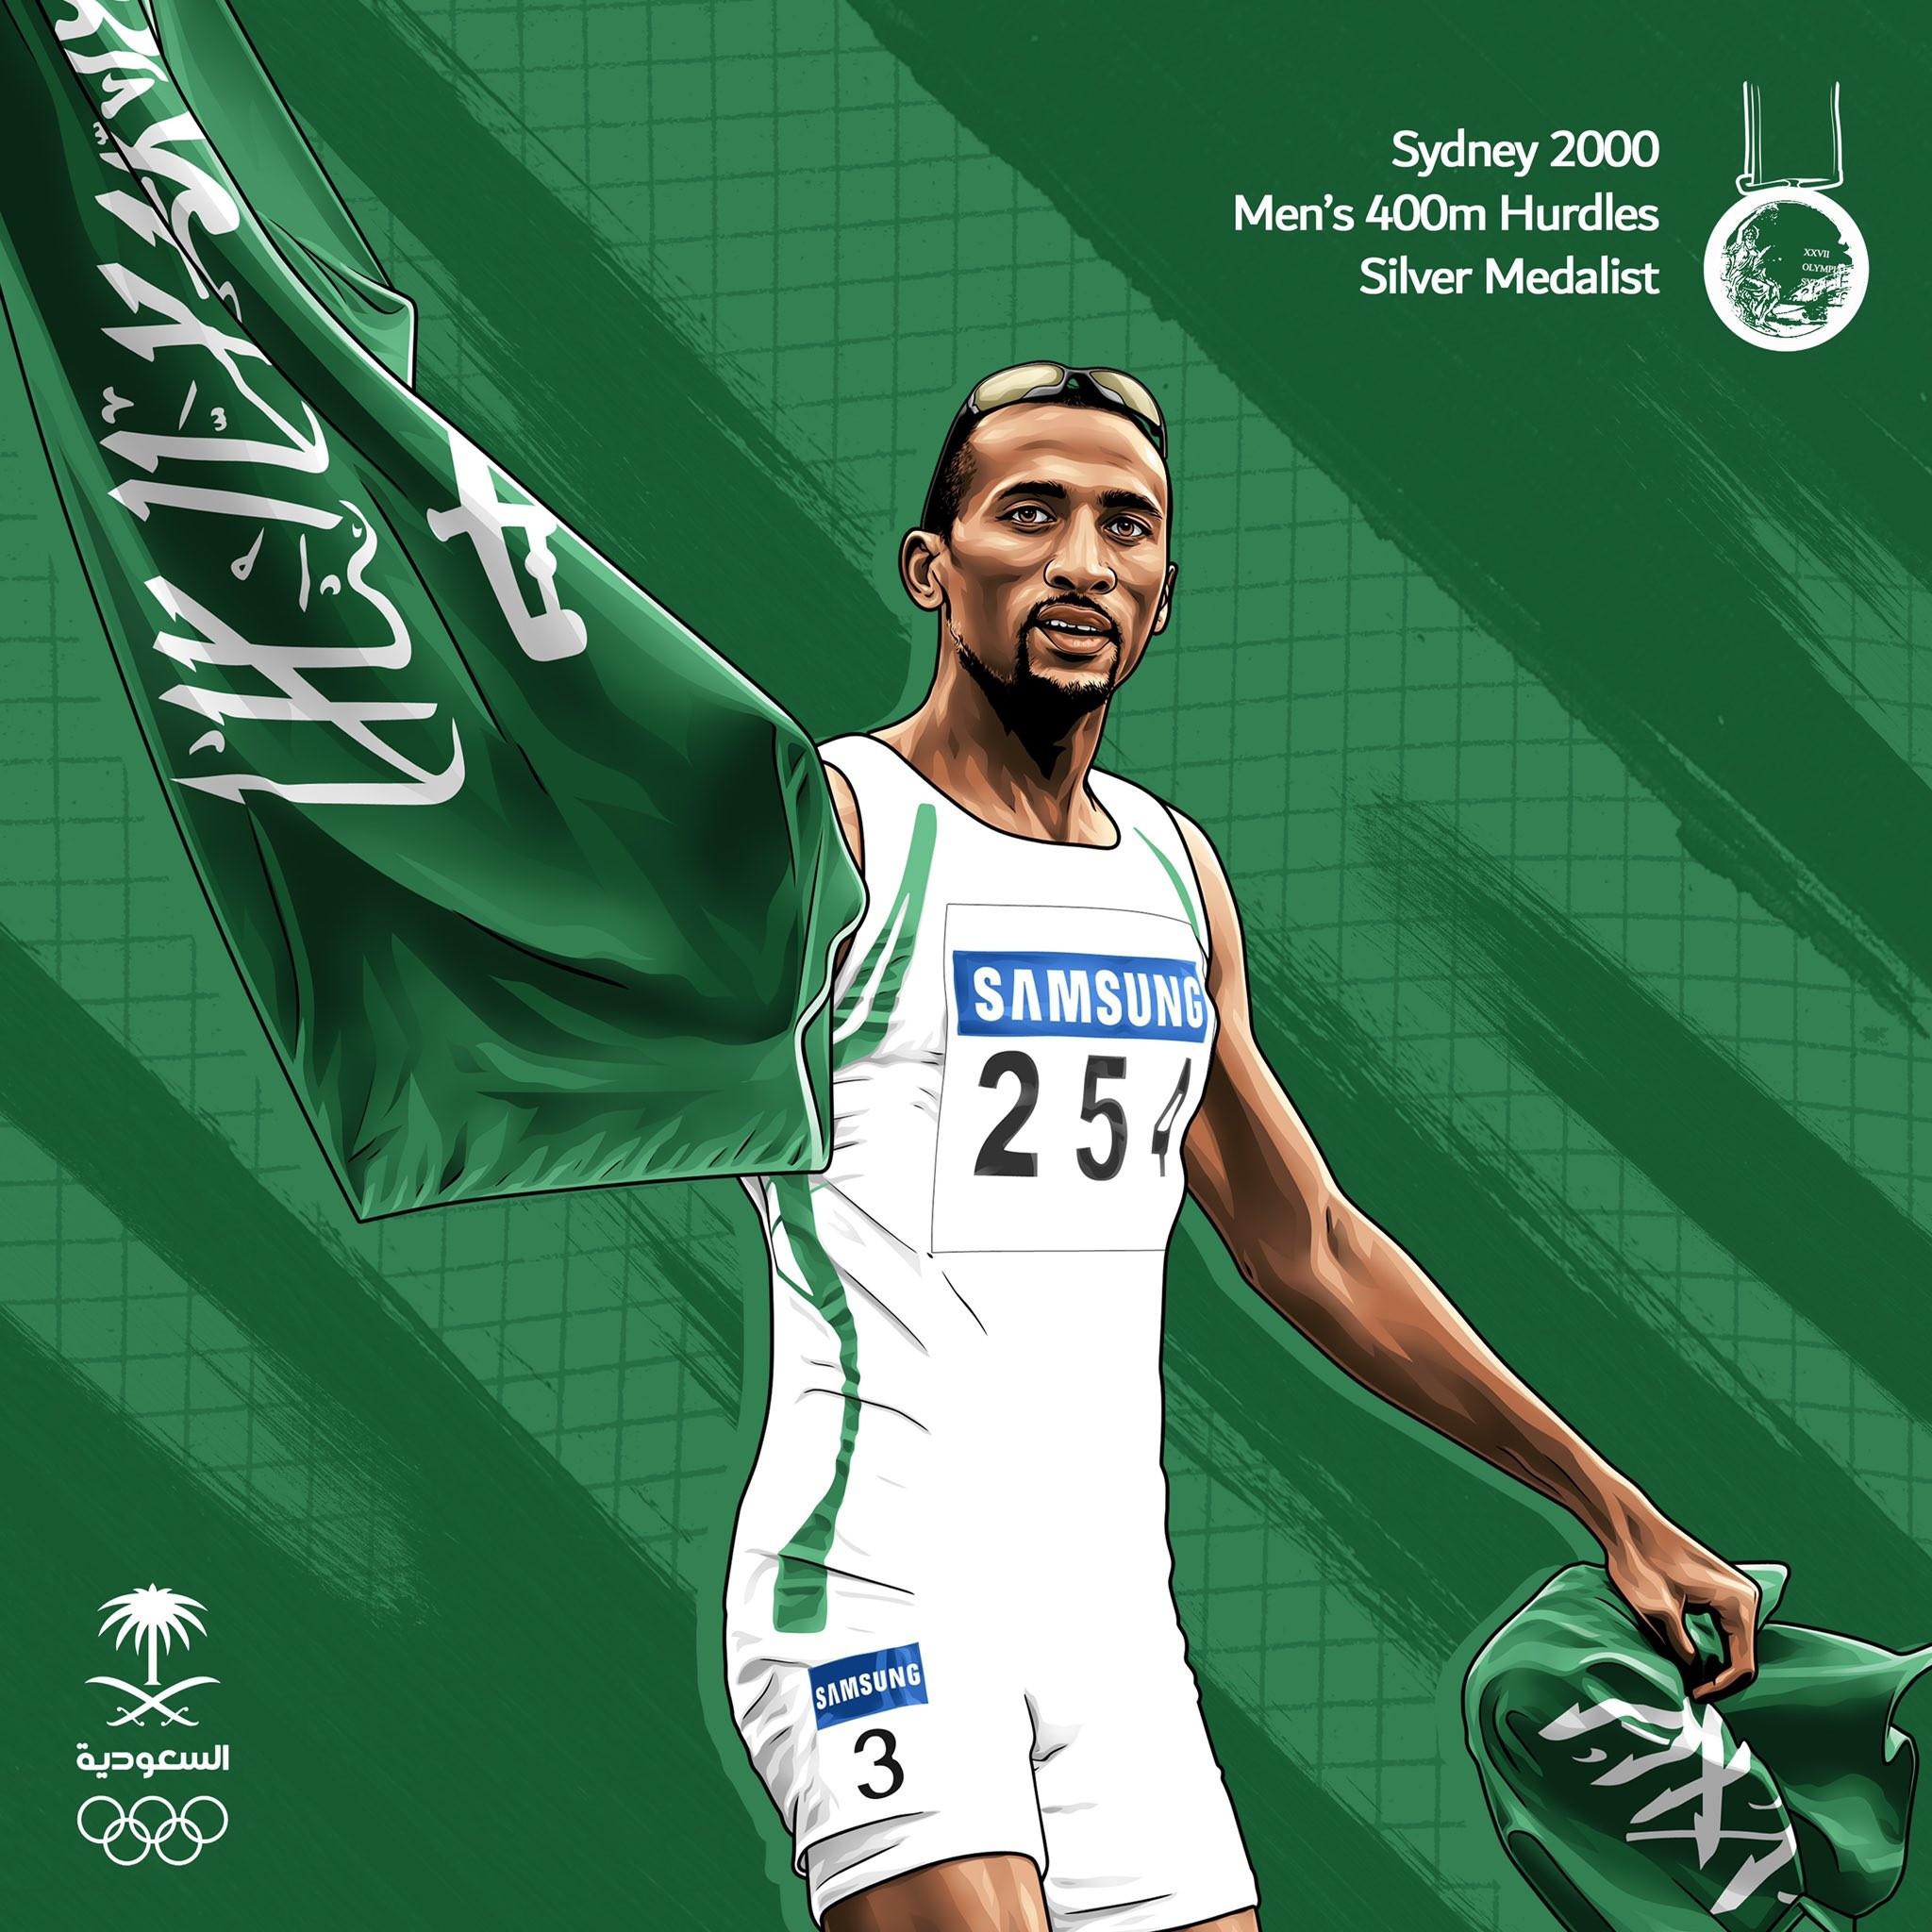 Hadi Soua'an Al Somaily won silver in the 400 metres hurdles at Sydney 2000 ©SAOC